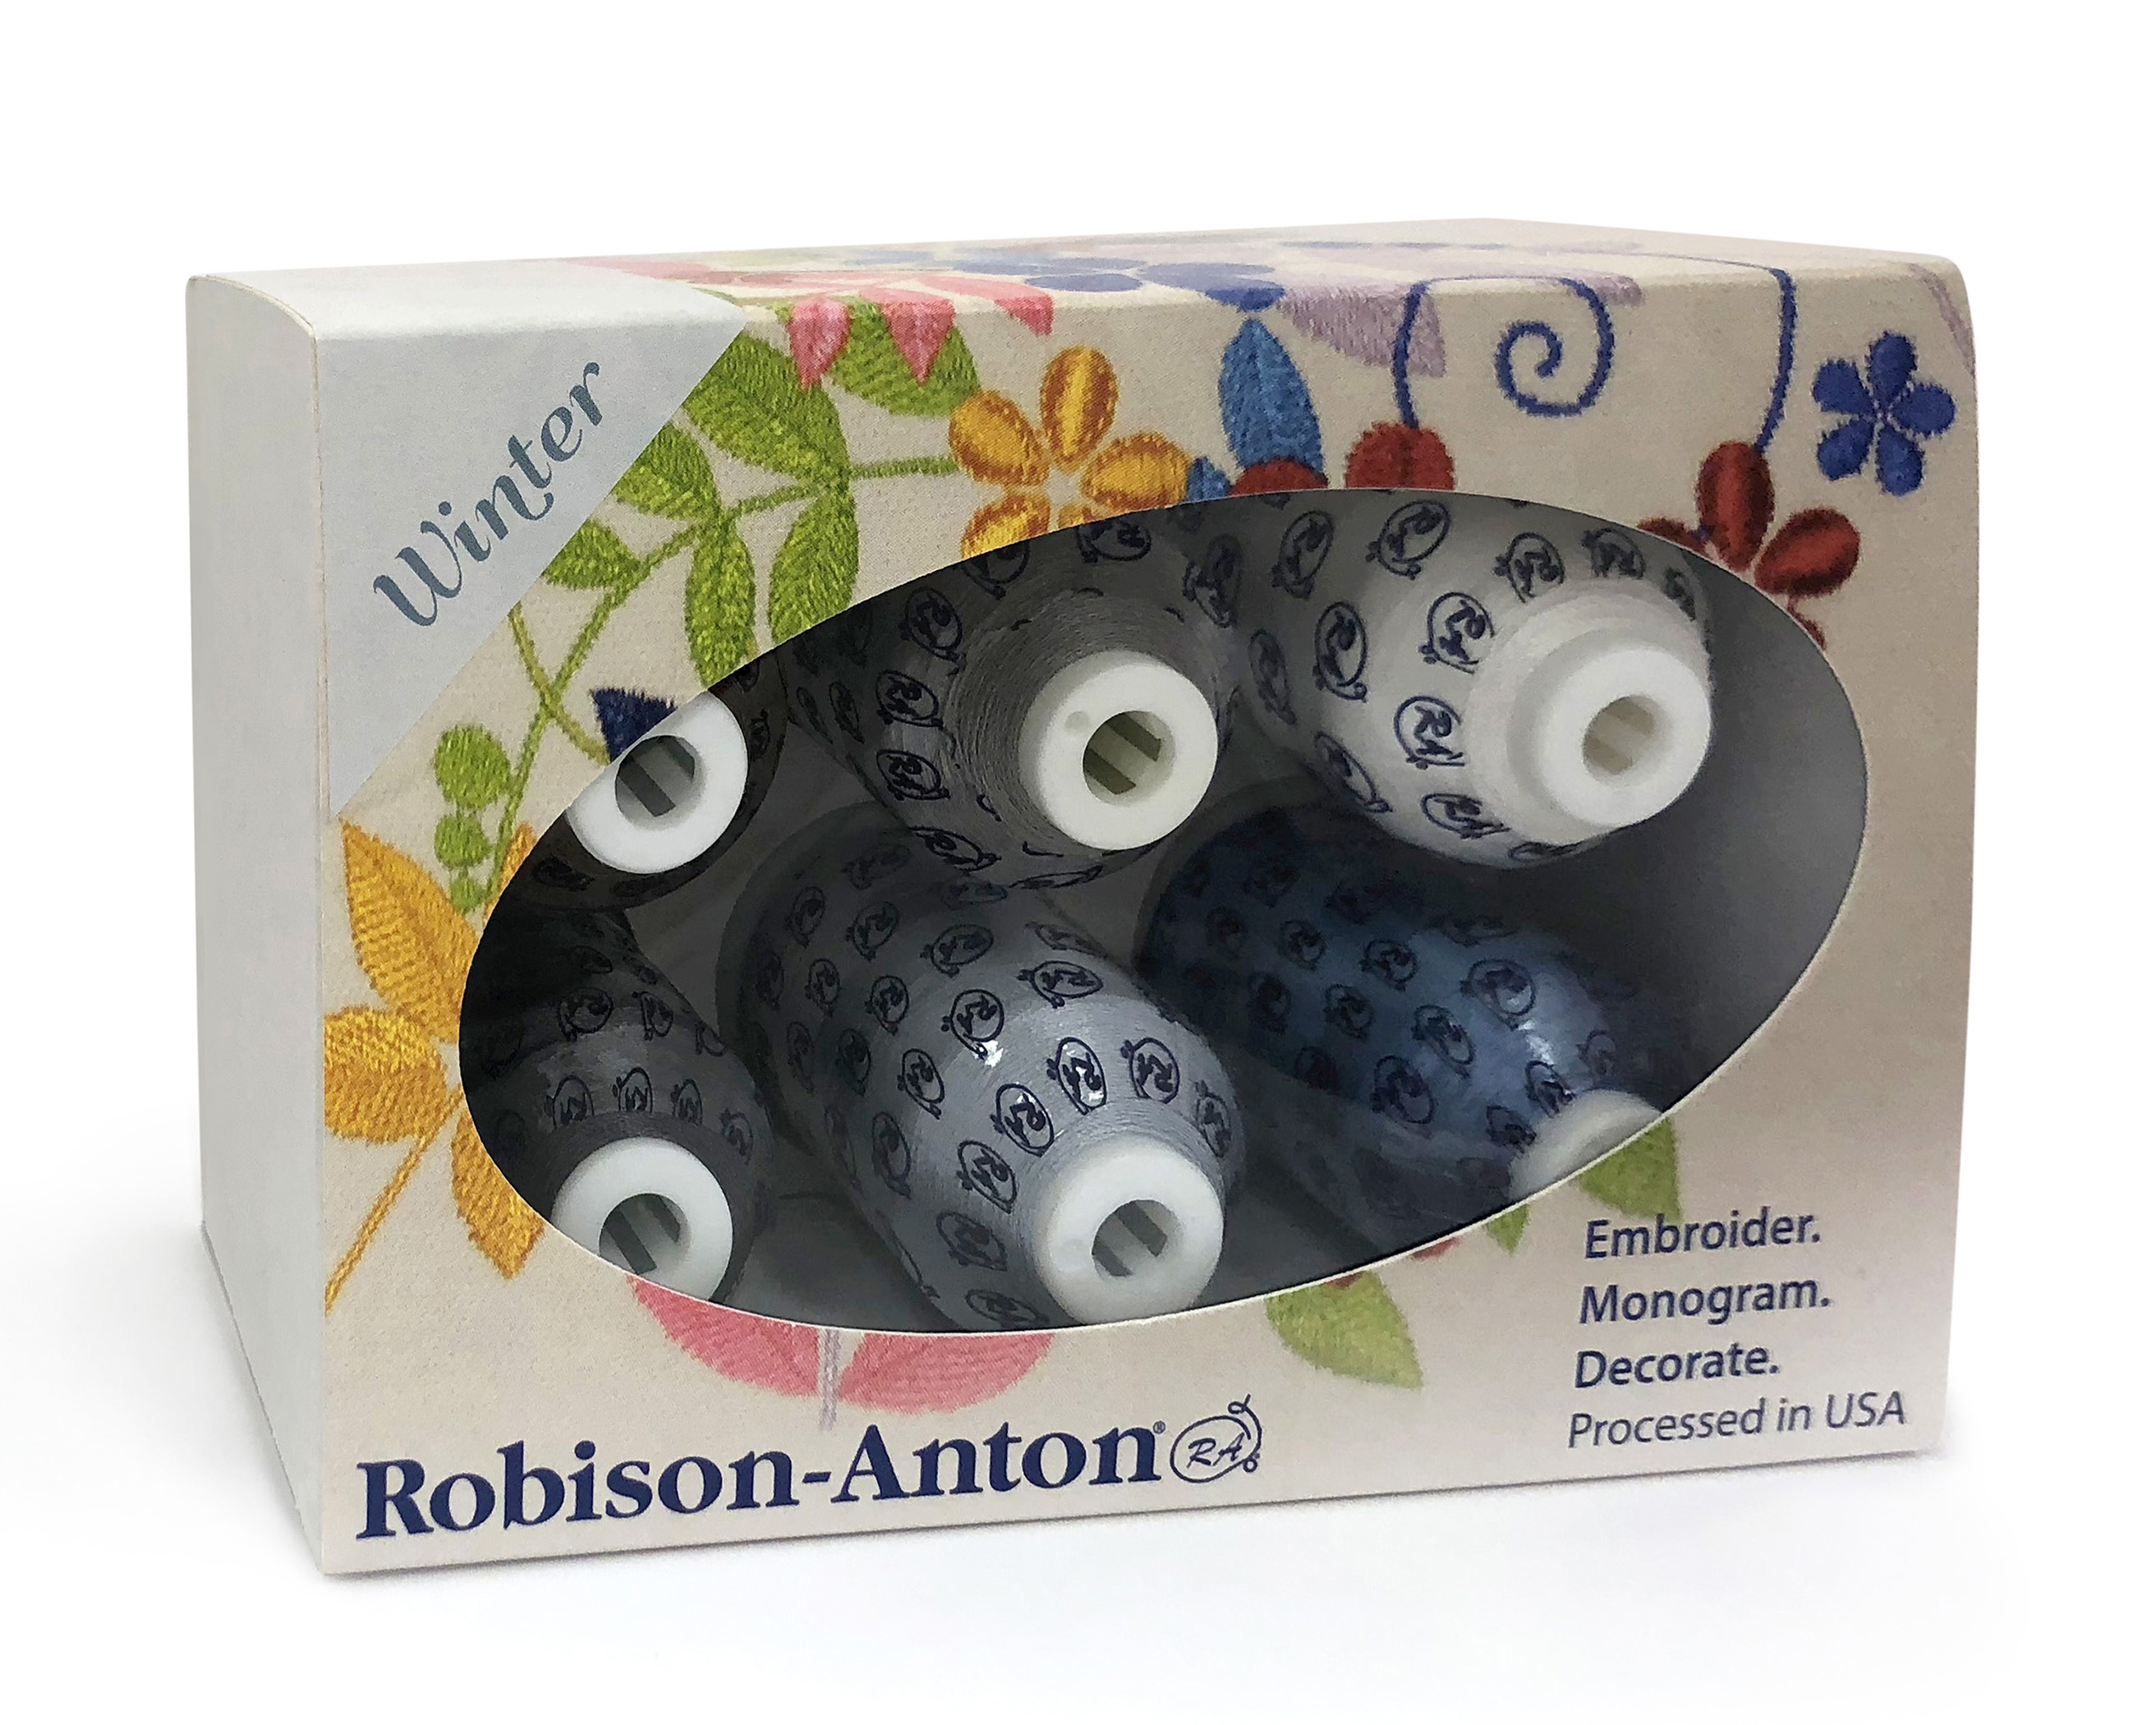 Robison-Anton Rayon Mini King 6 Spool Gift Pack - Winter